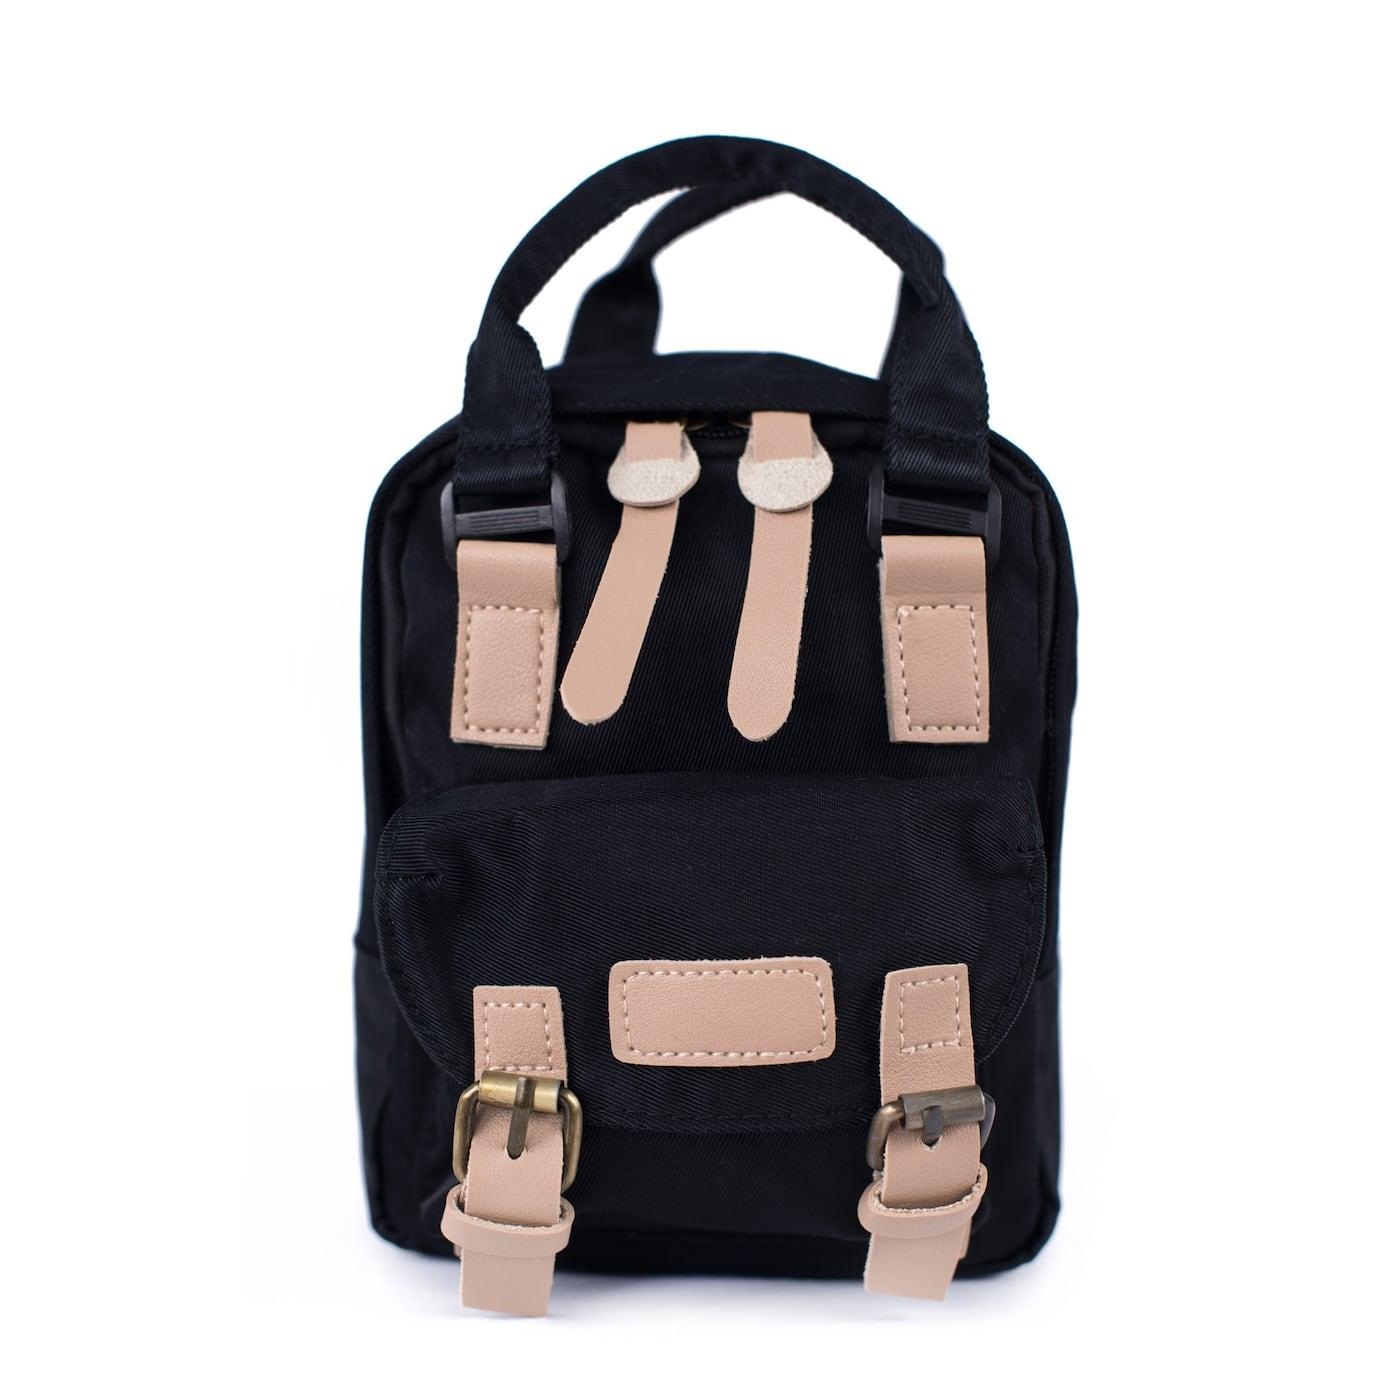 Art Of Polo Unisex's Backpack tr19543